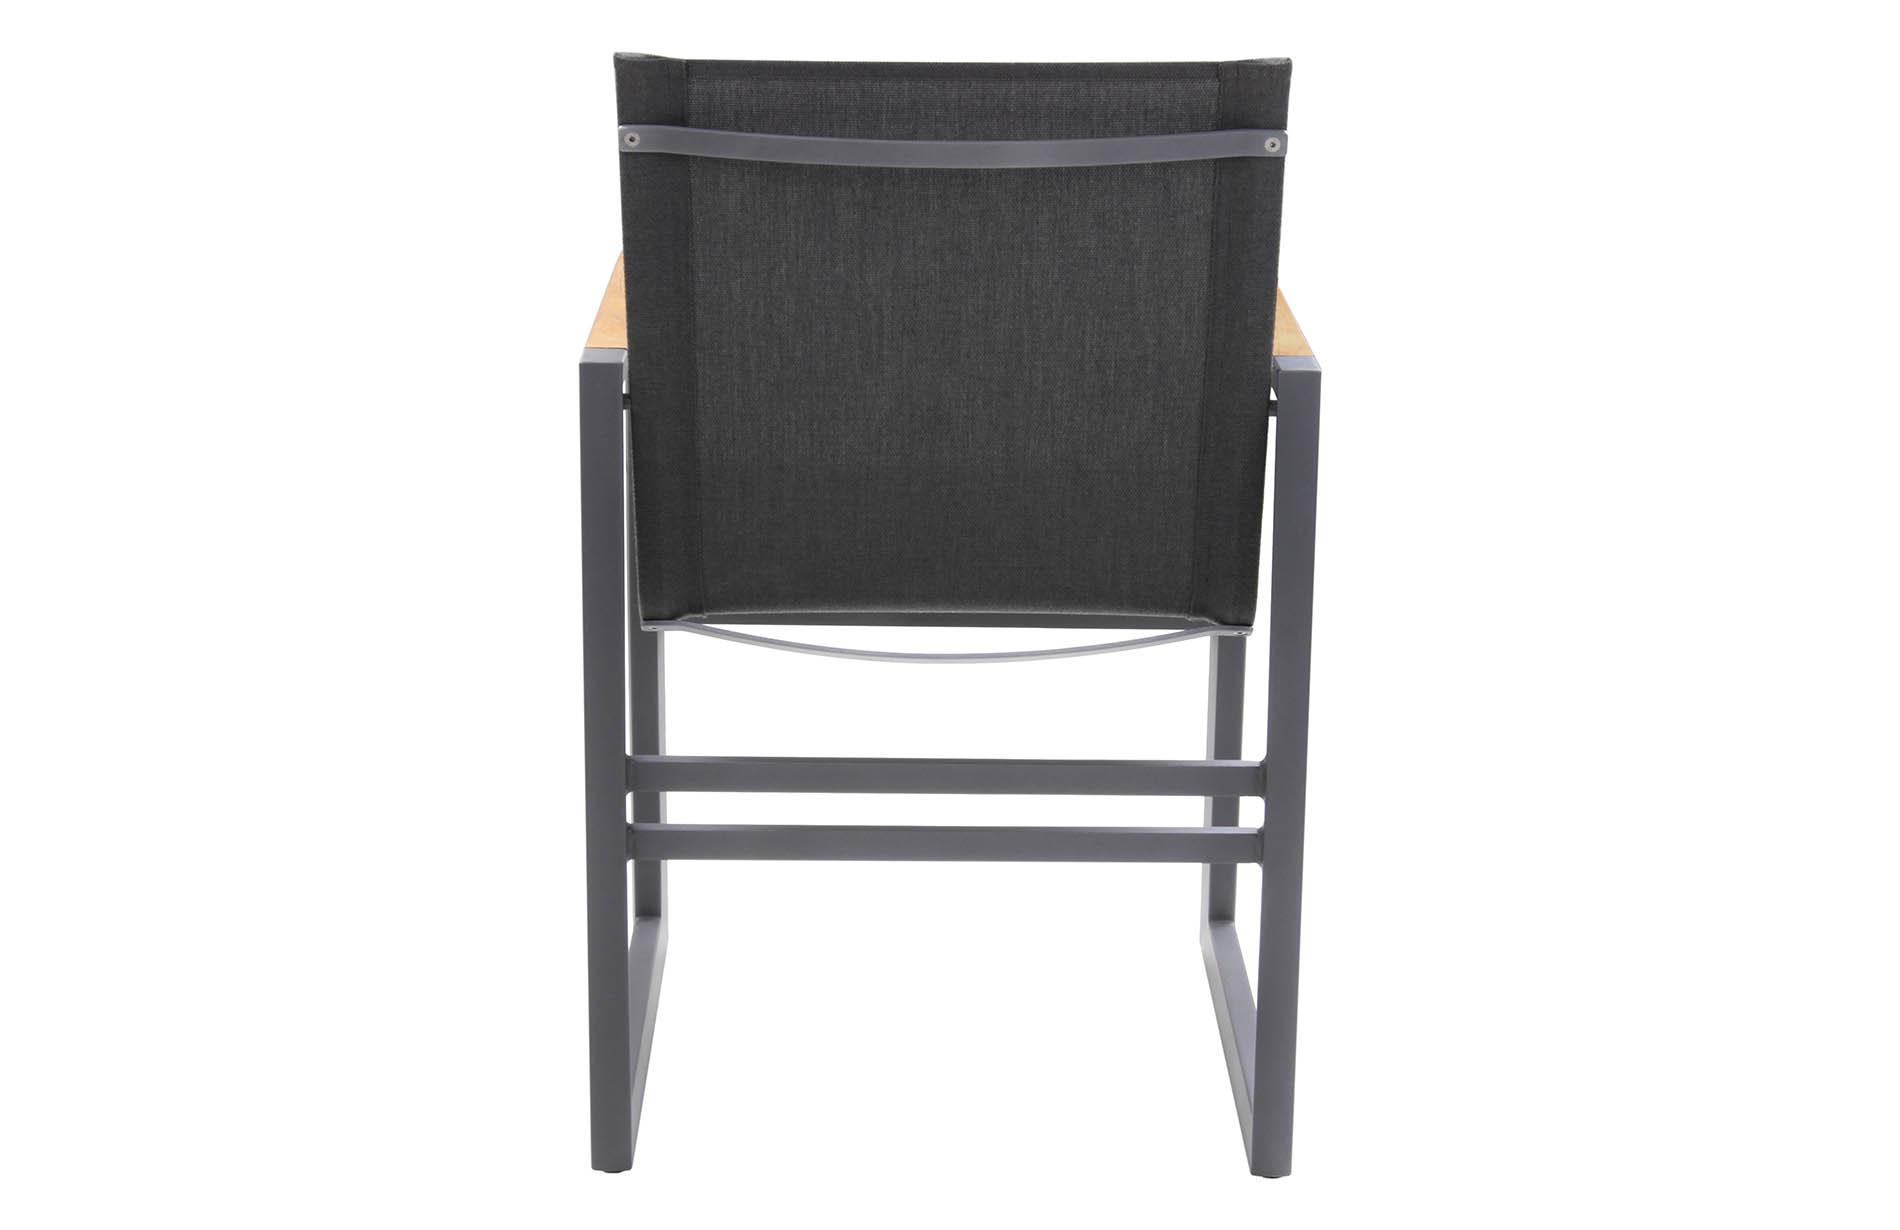 Cube Alu Dining Chair 5.jpg